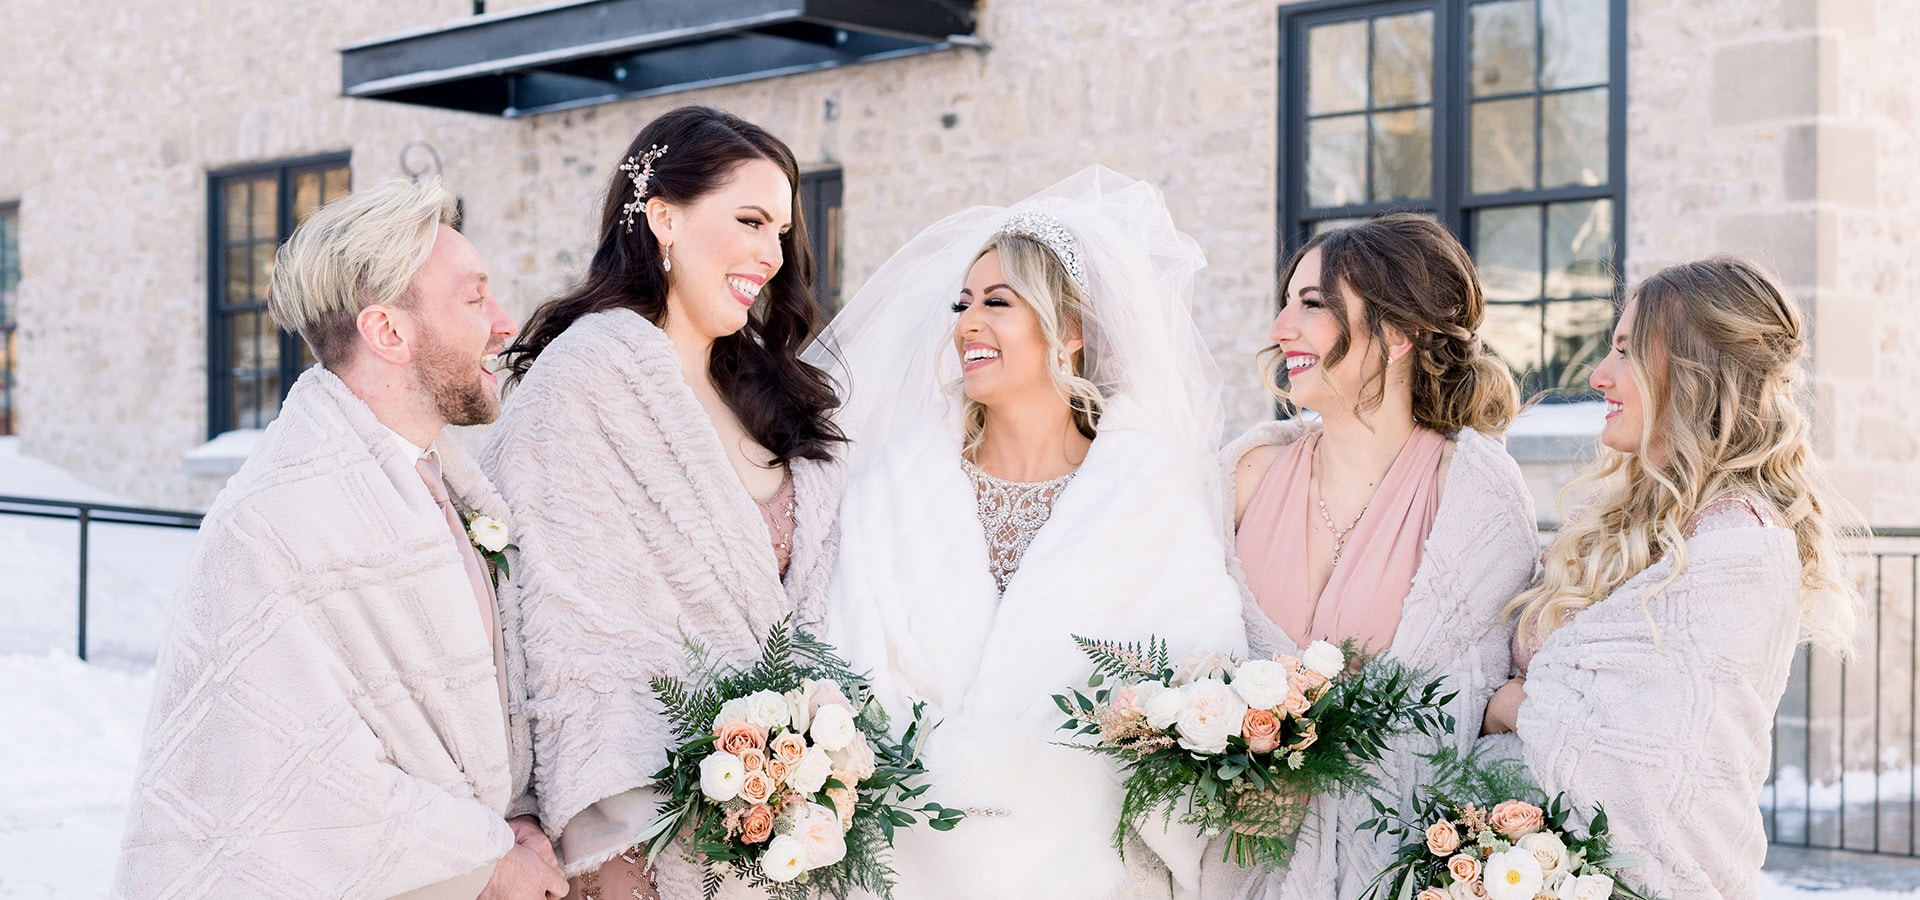 Hero image for Amanda and Mark's Stunning Winter Wedding at Elora Mill